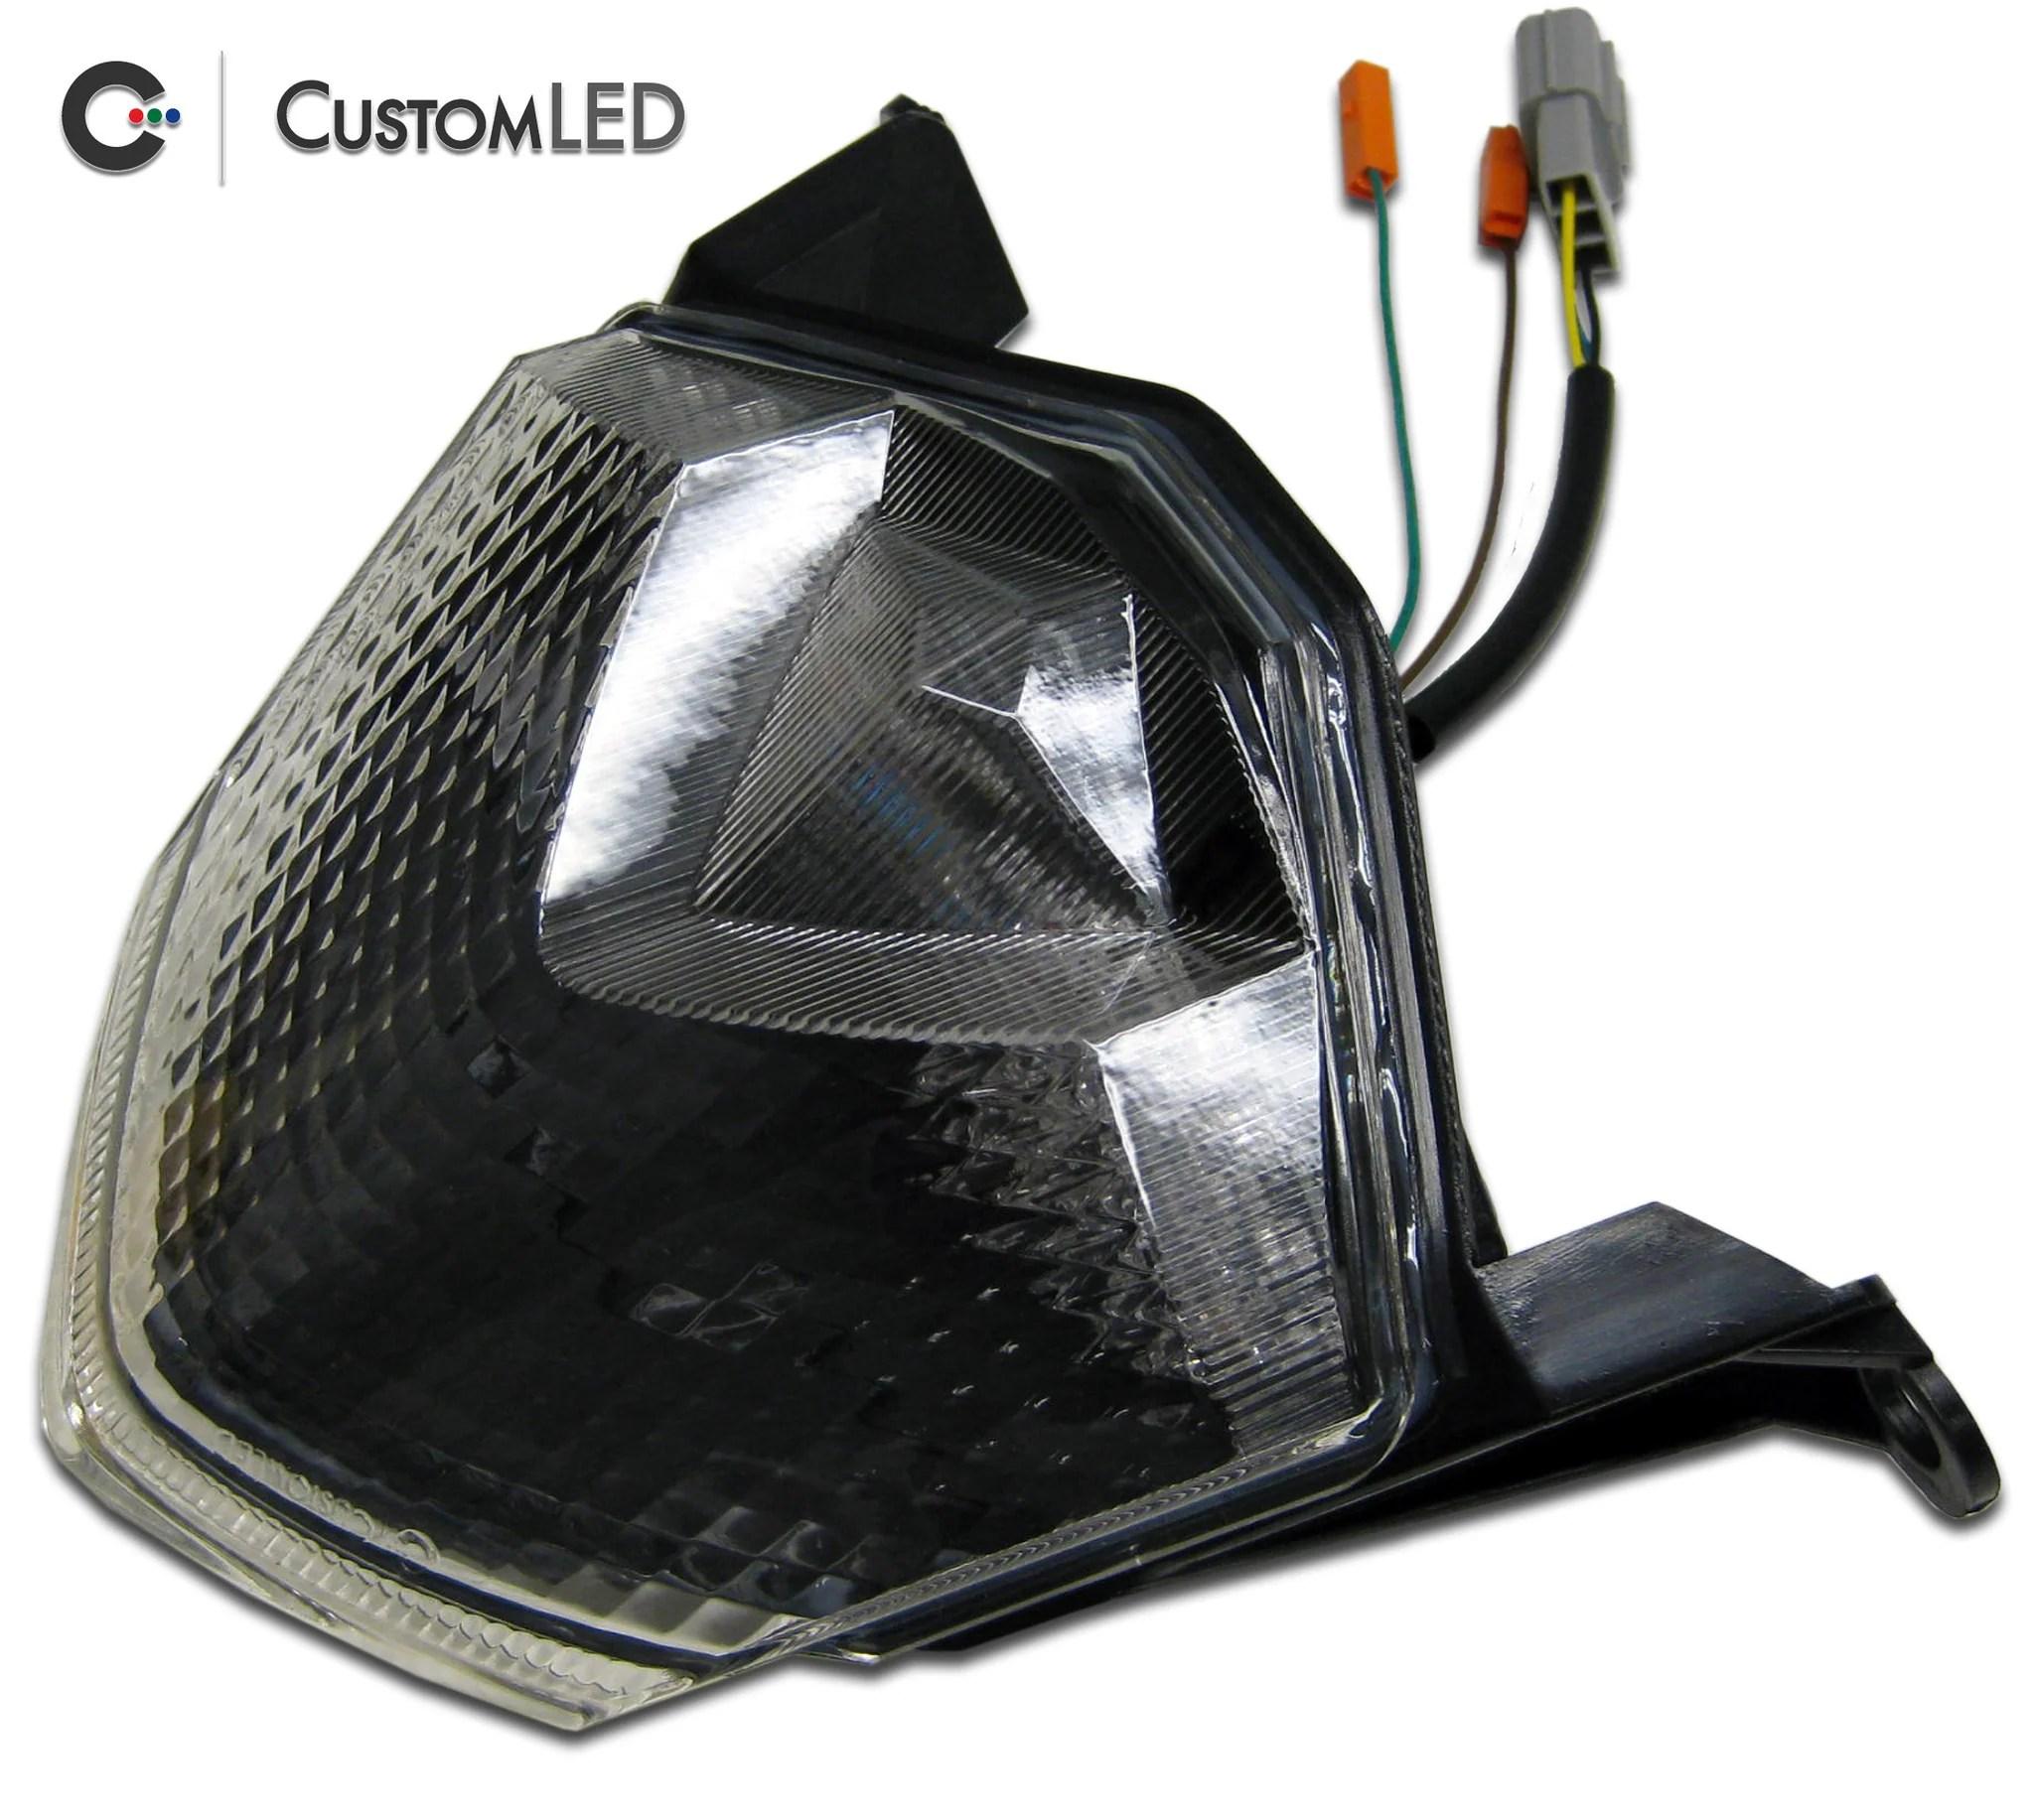 small resolution of kawasaki ninja zx 10r blaster x integrated led tail light for years 2008 2009